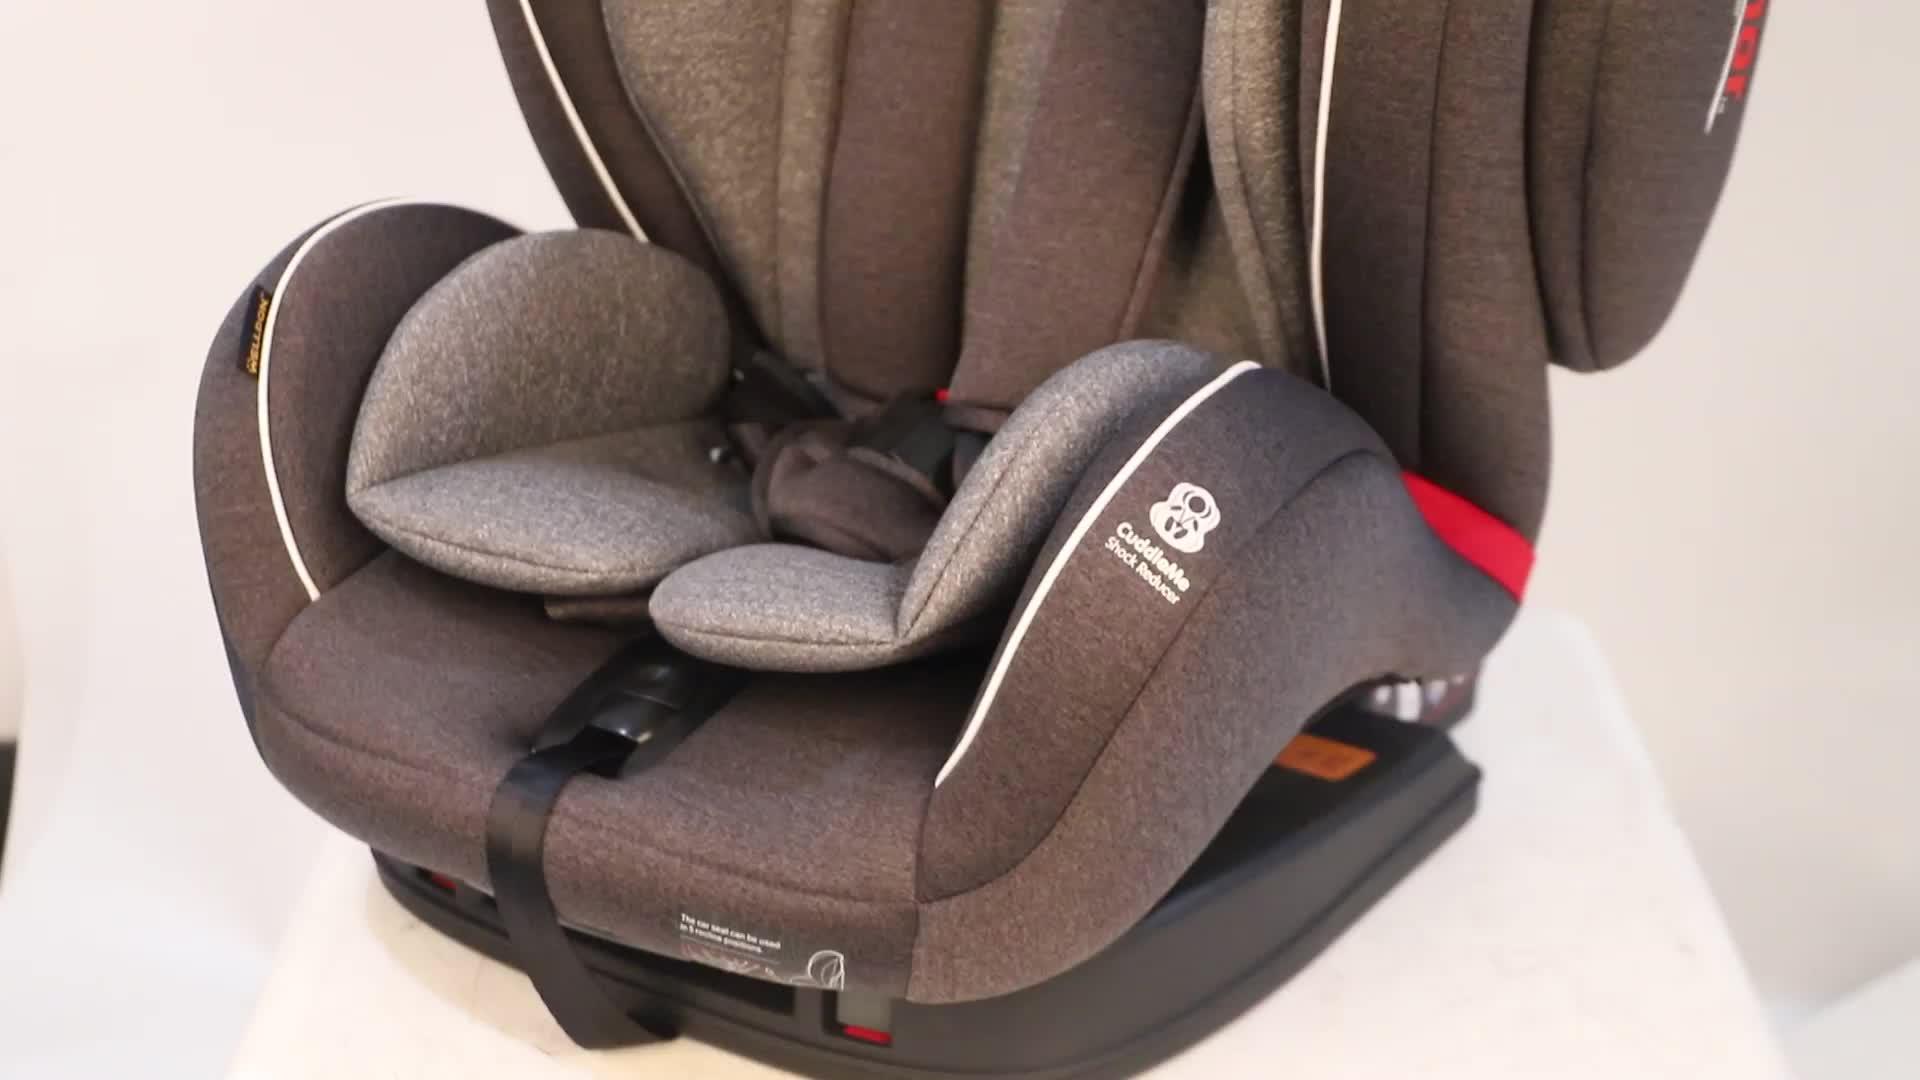 JOVIKIDS 2020 China Manufacturer portable adjustable foldable soft plush cushion carseat car child baby safety car seat